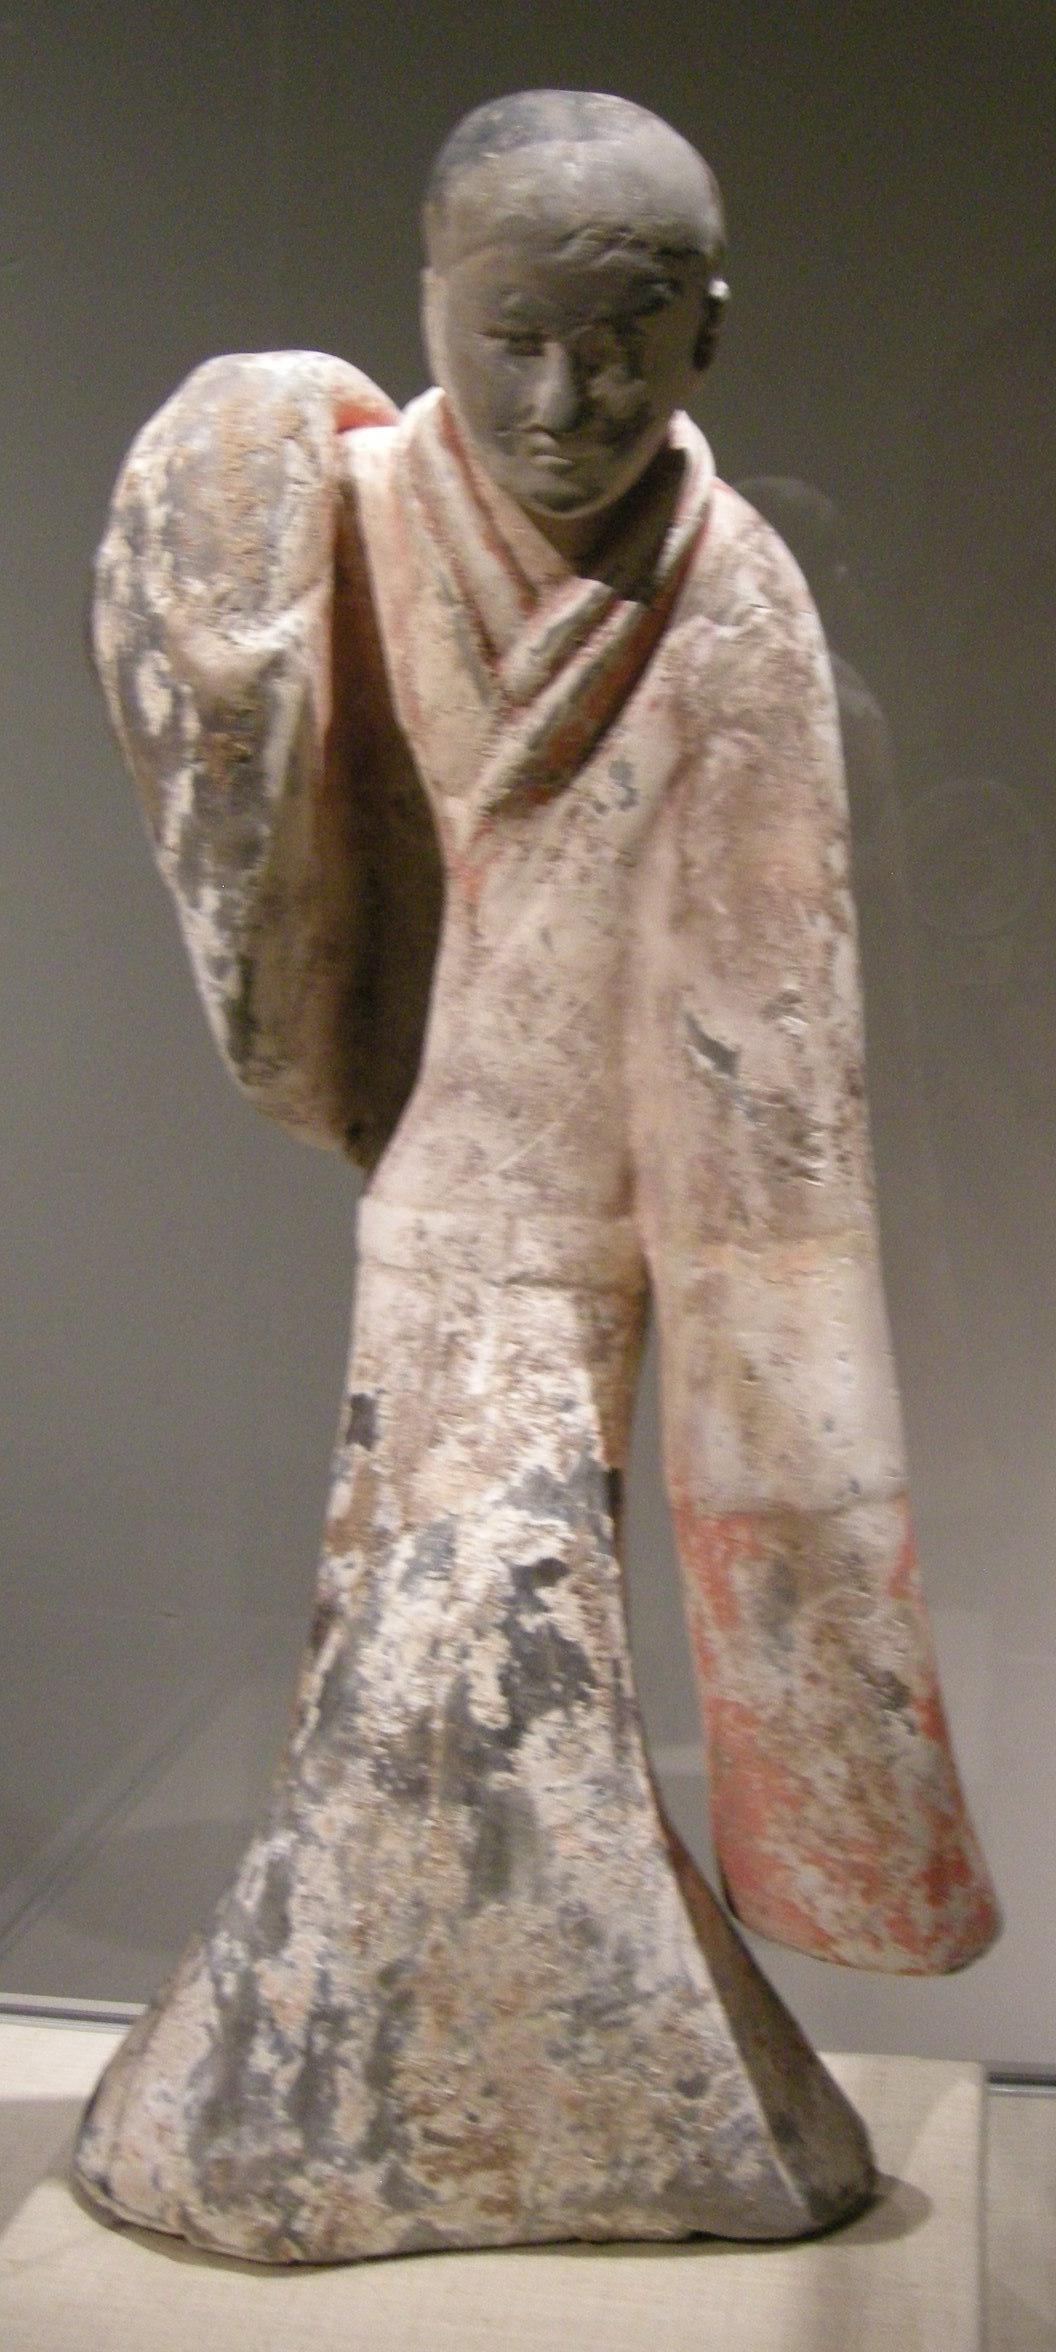 Met C Female Dancer C Western Han Dynasty C Nd Century Bc